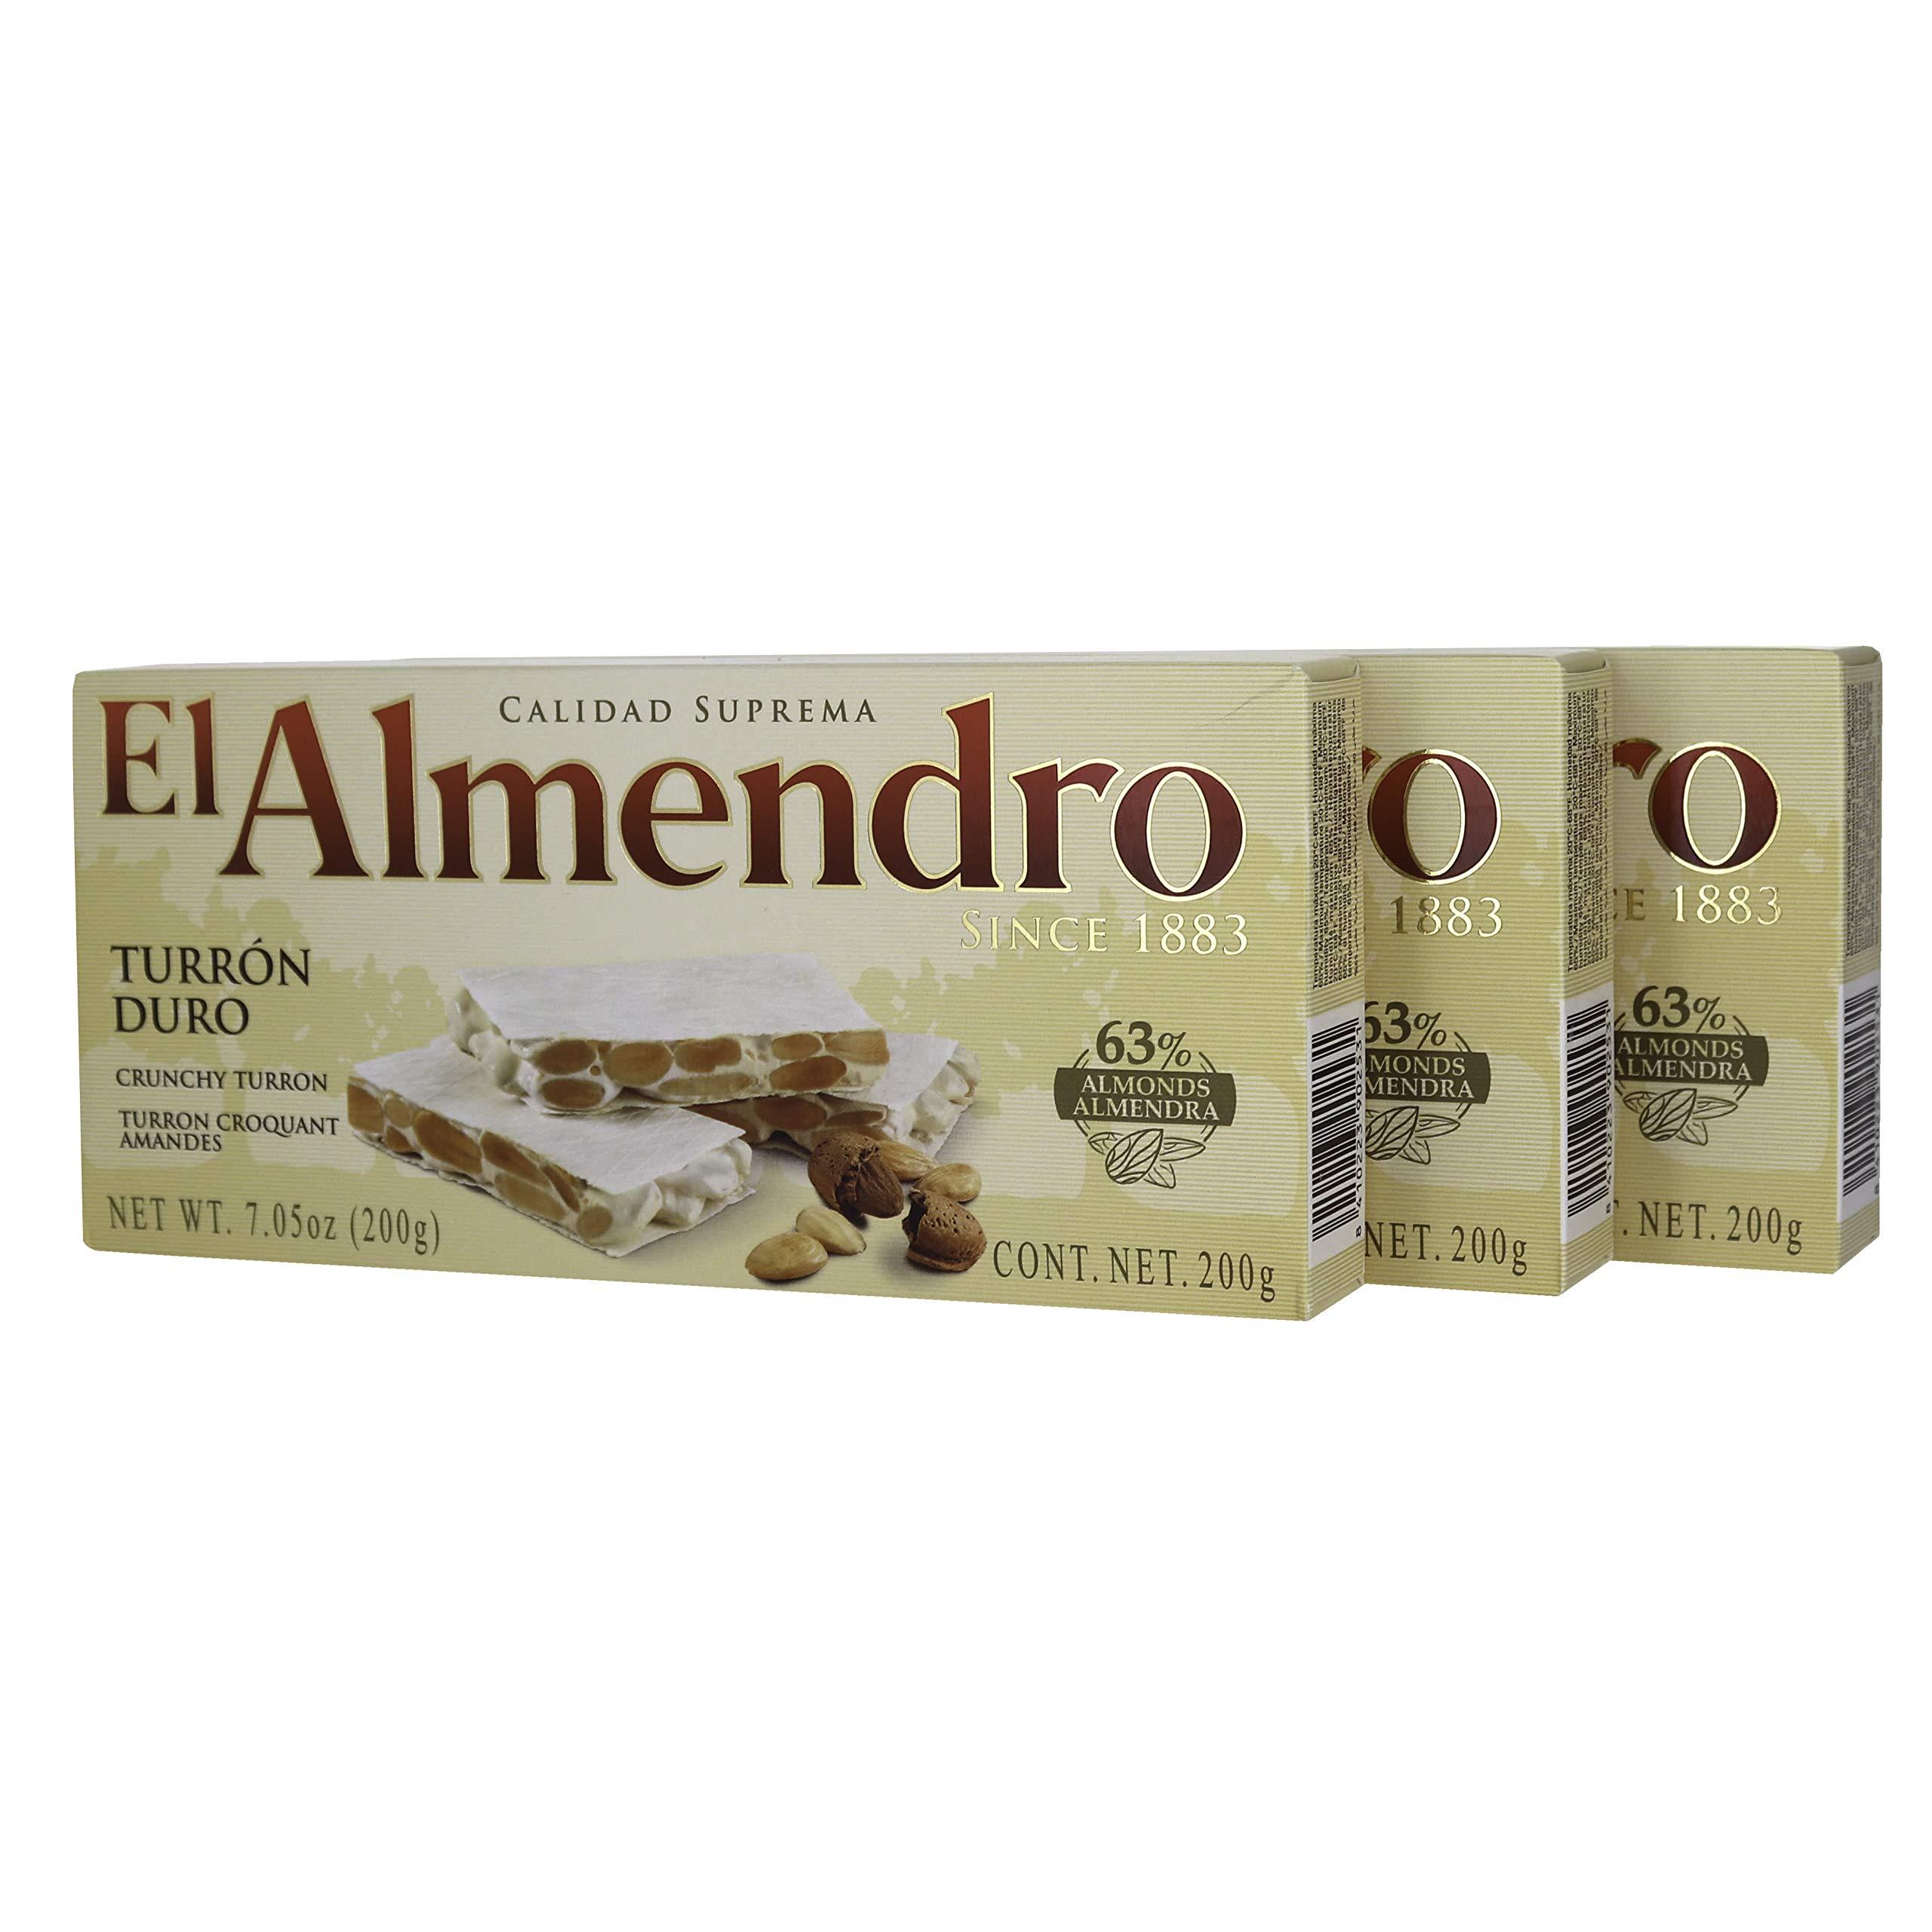 El Almendro Turron Duro Crunchy Nougat - (3 Pack) by El Almendro